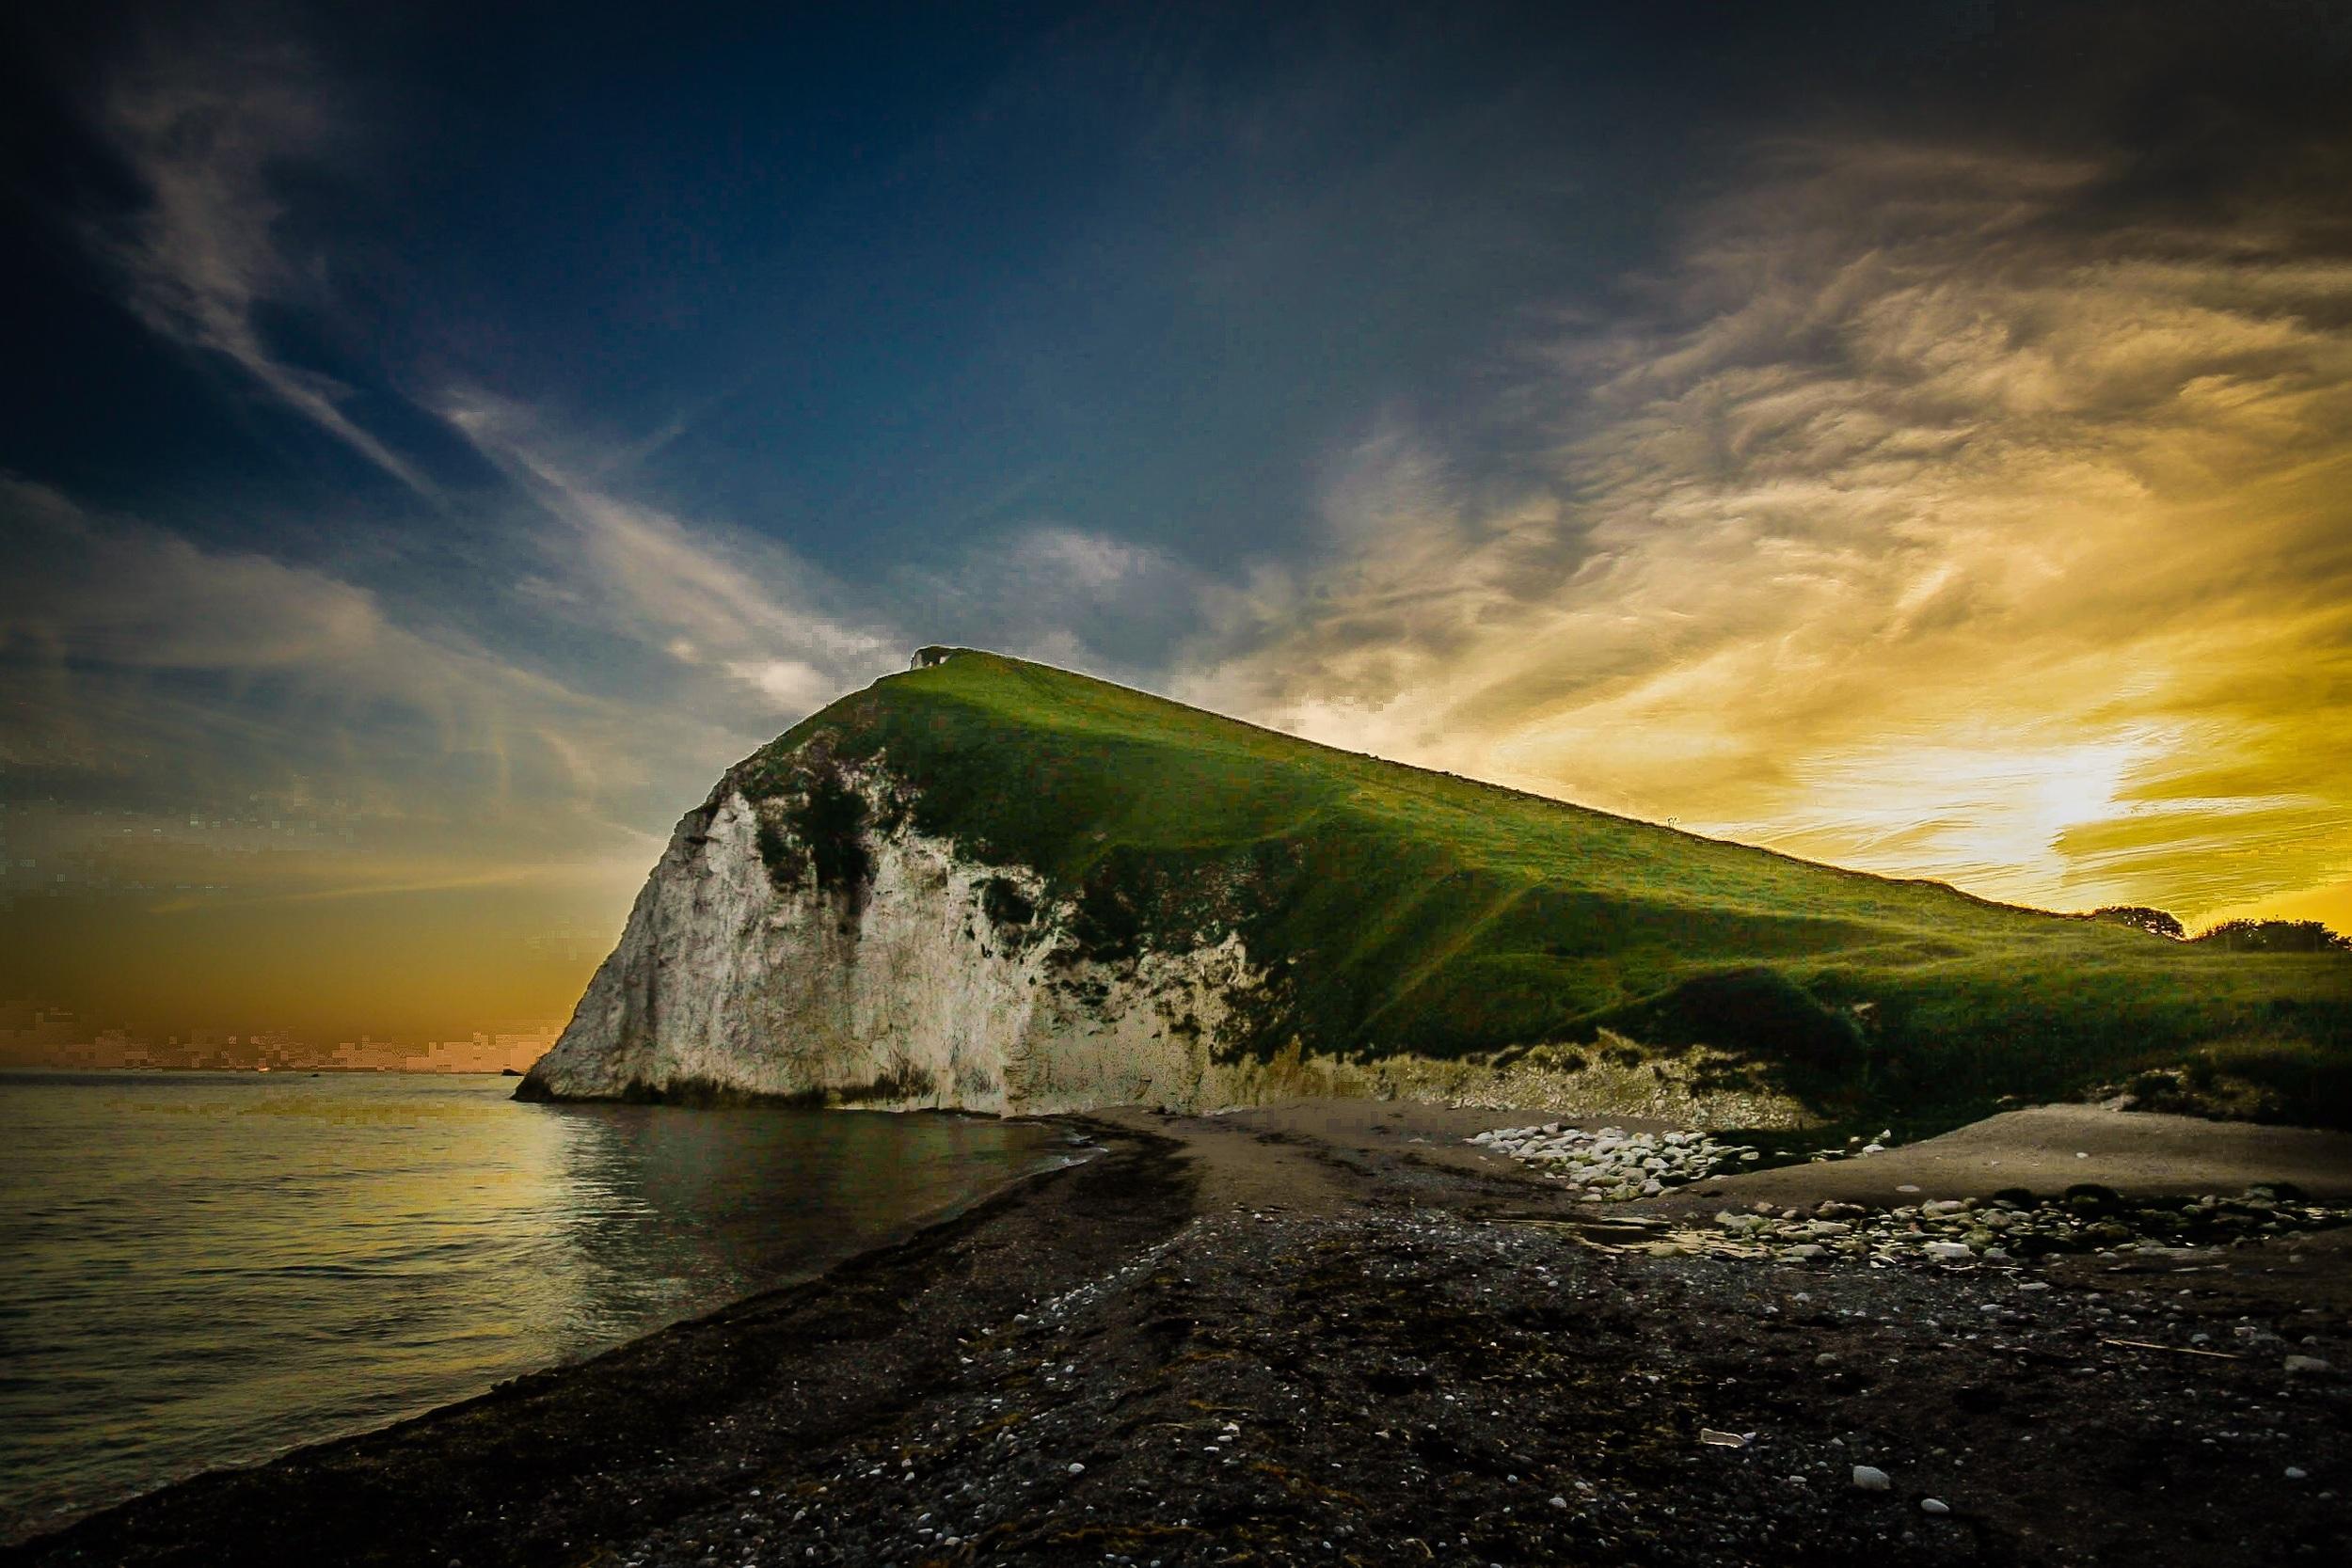 Mupe Bay, Dorset by Rick McEvoy DOrset Photographer